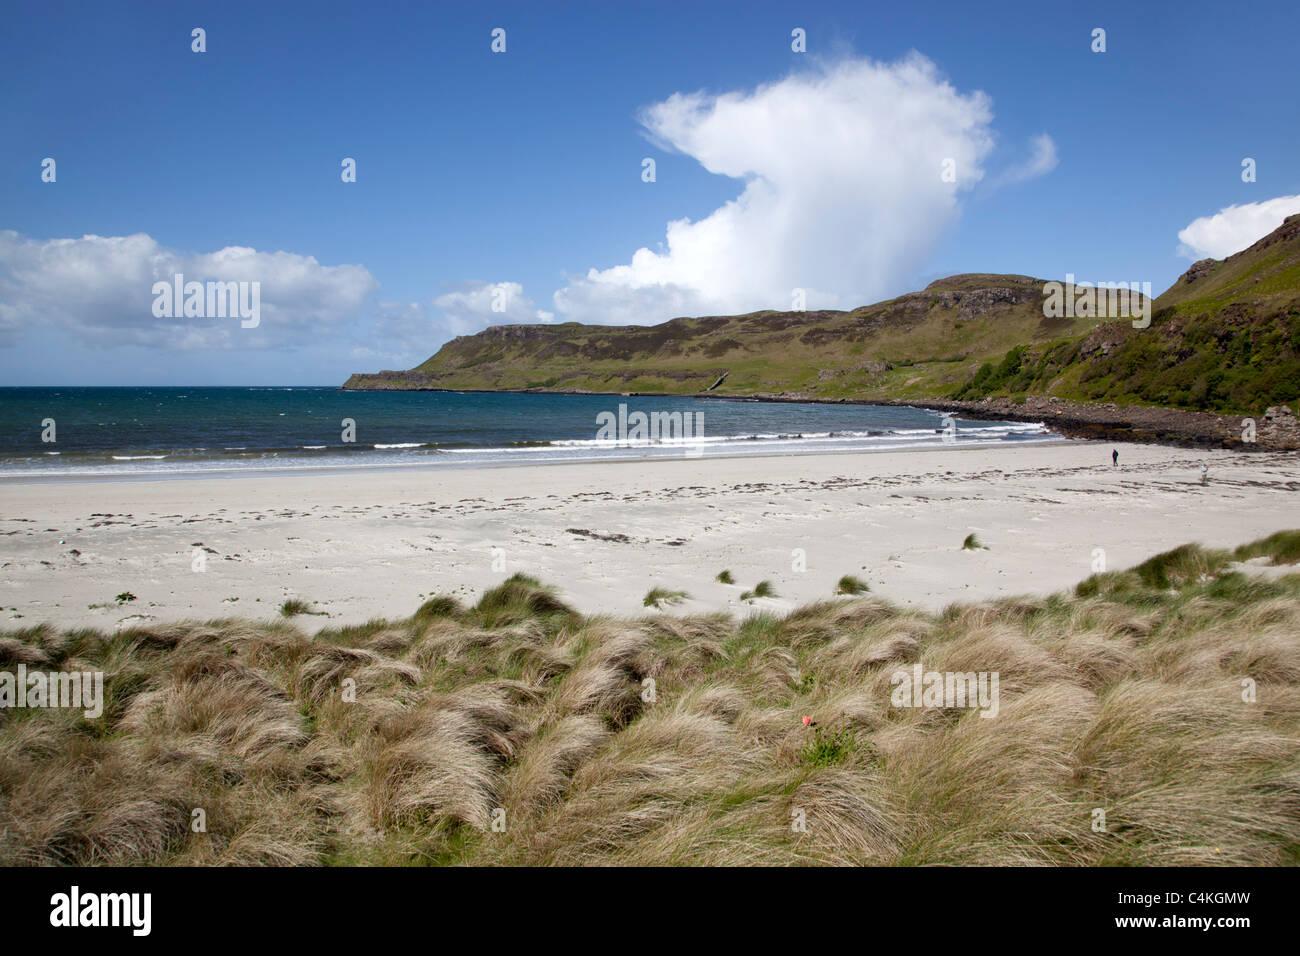 Calgary Bay; Isle of Mull; Scozia Immagini Stock